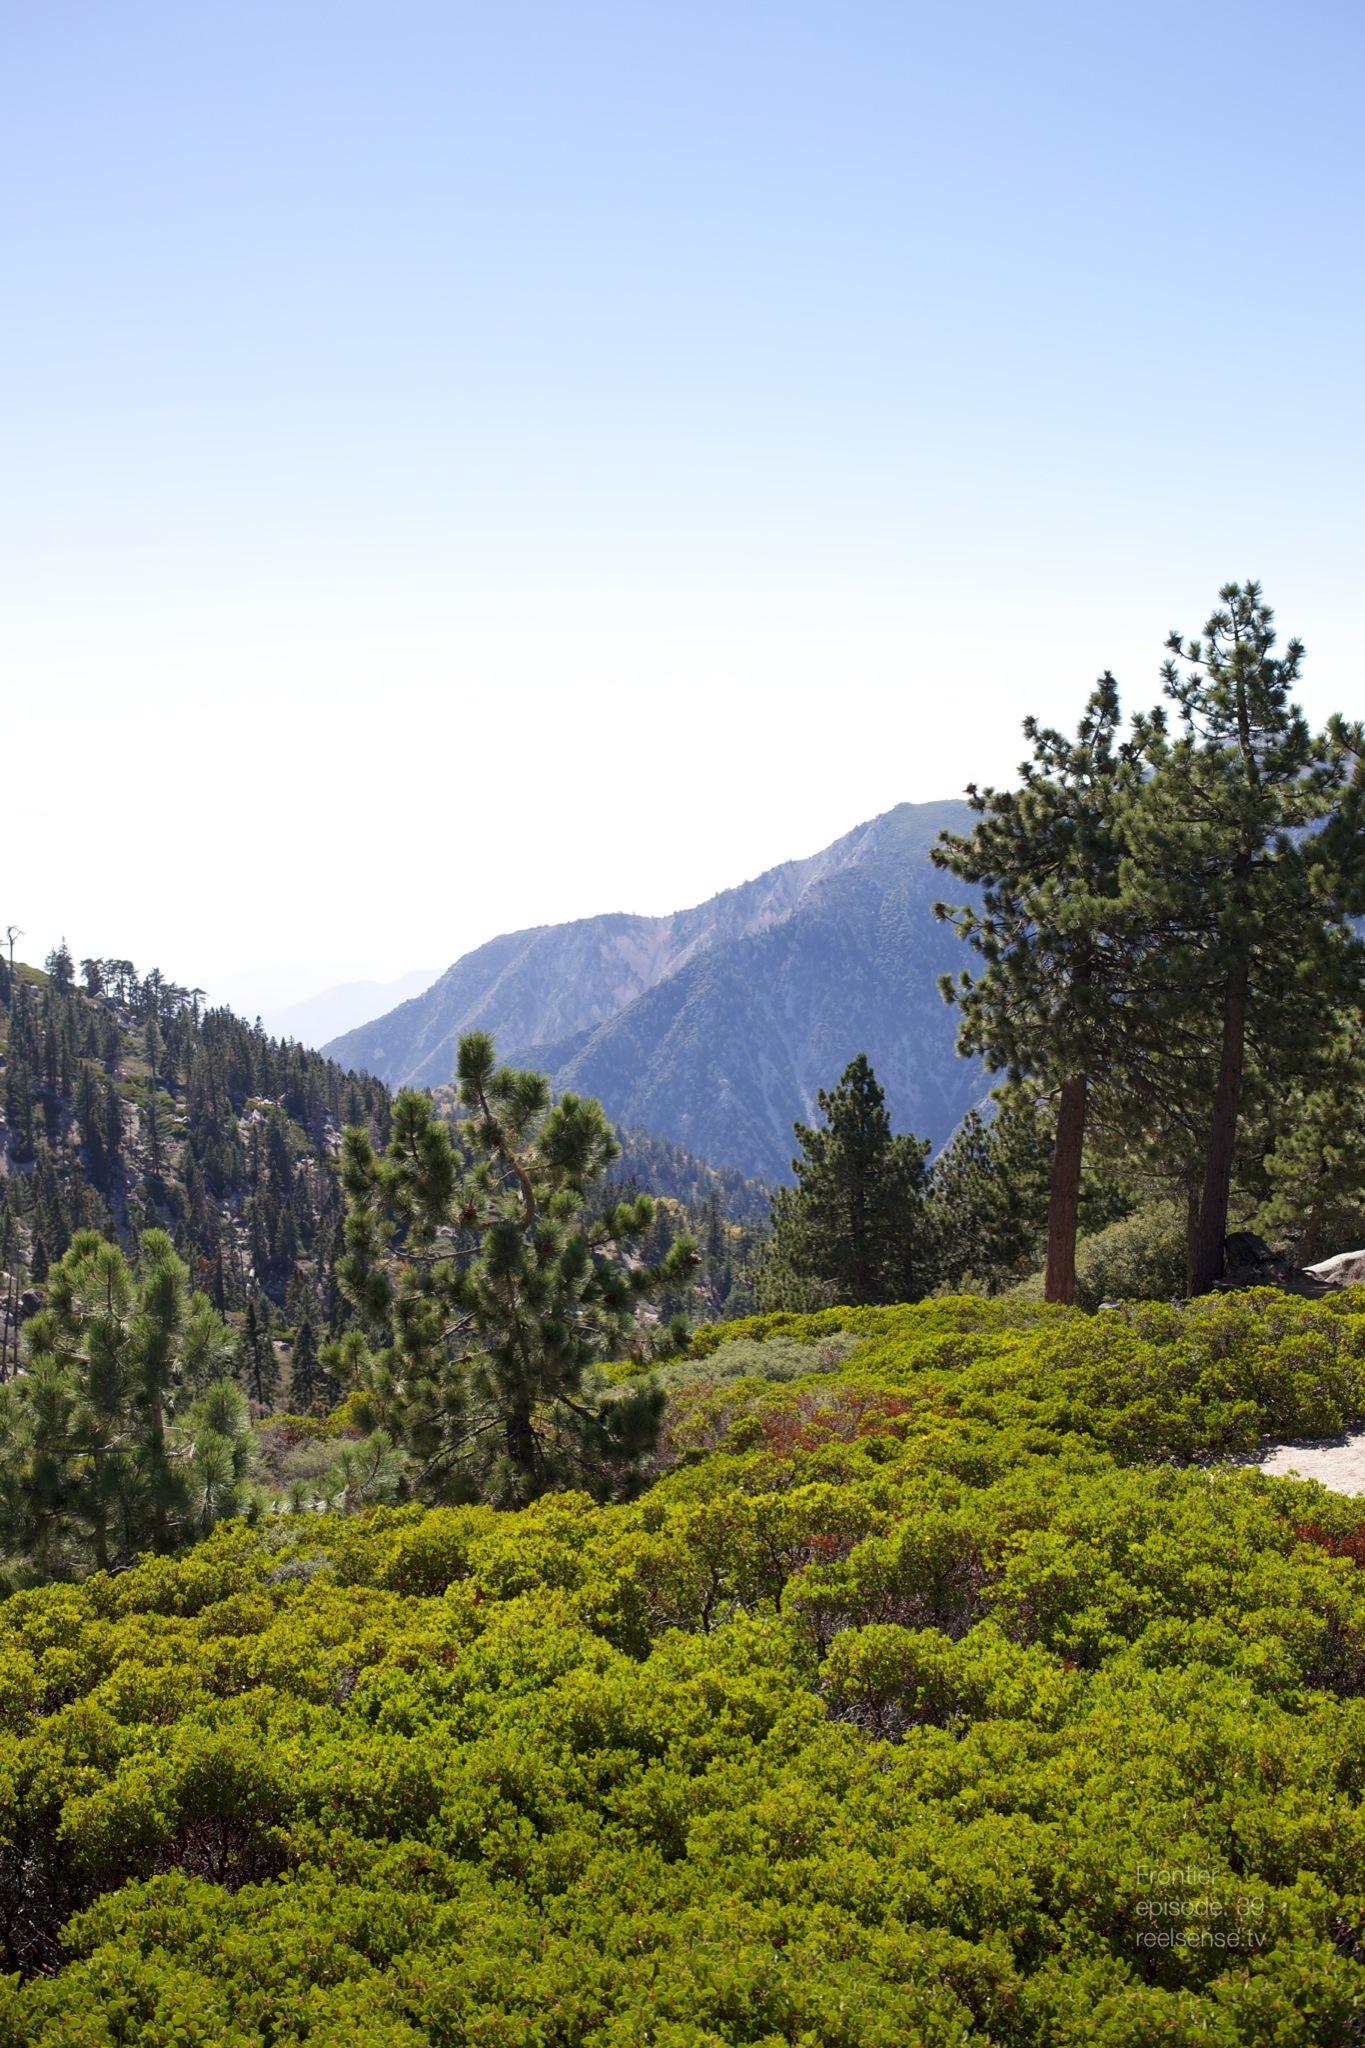 Big Bear, CA - Altitude 2360 m or 7744 ft